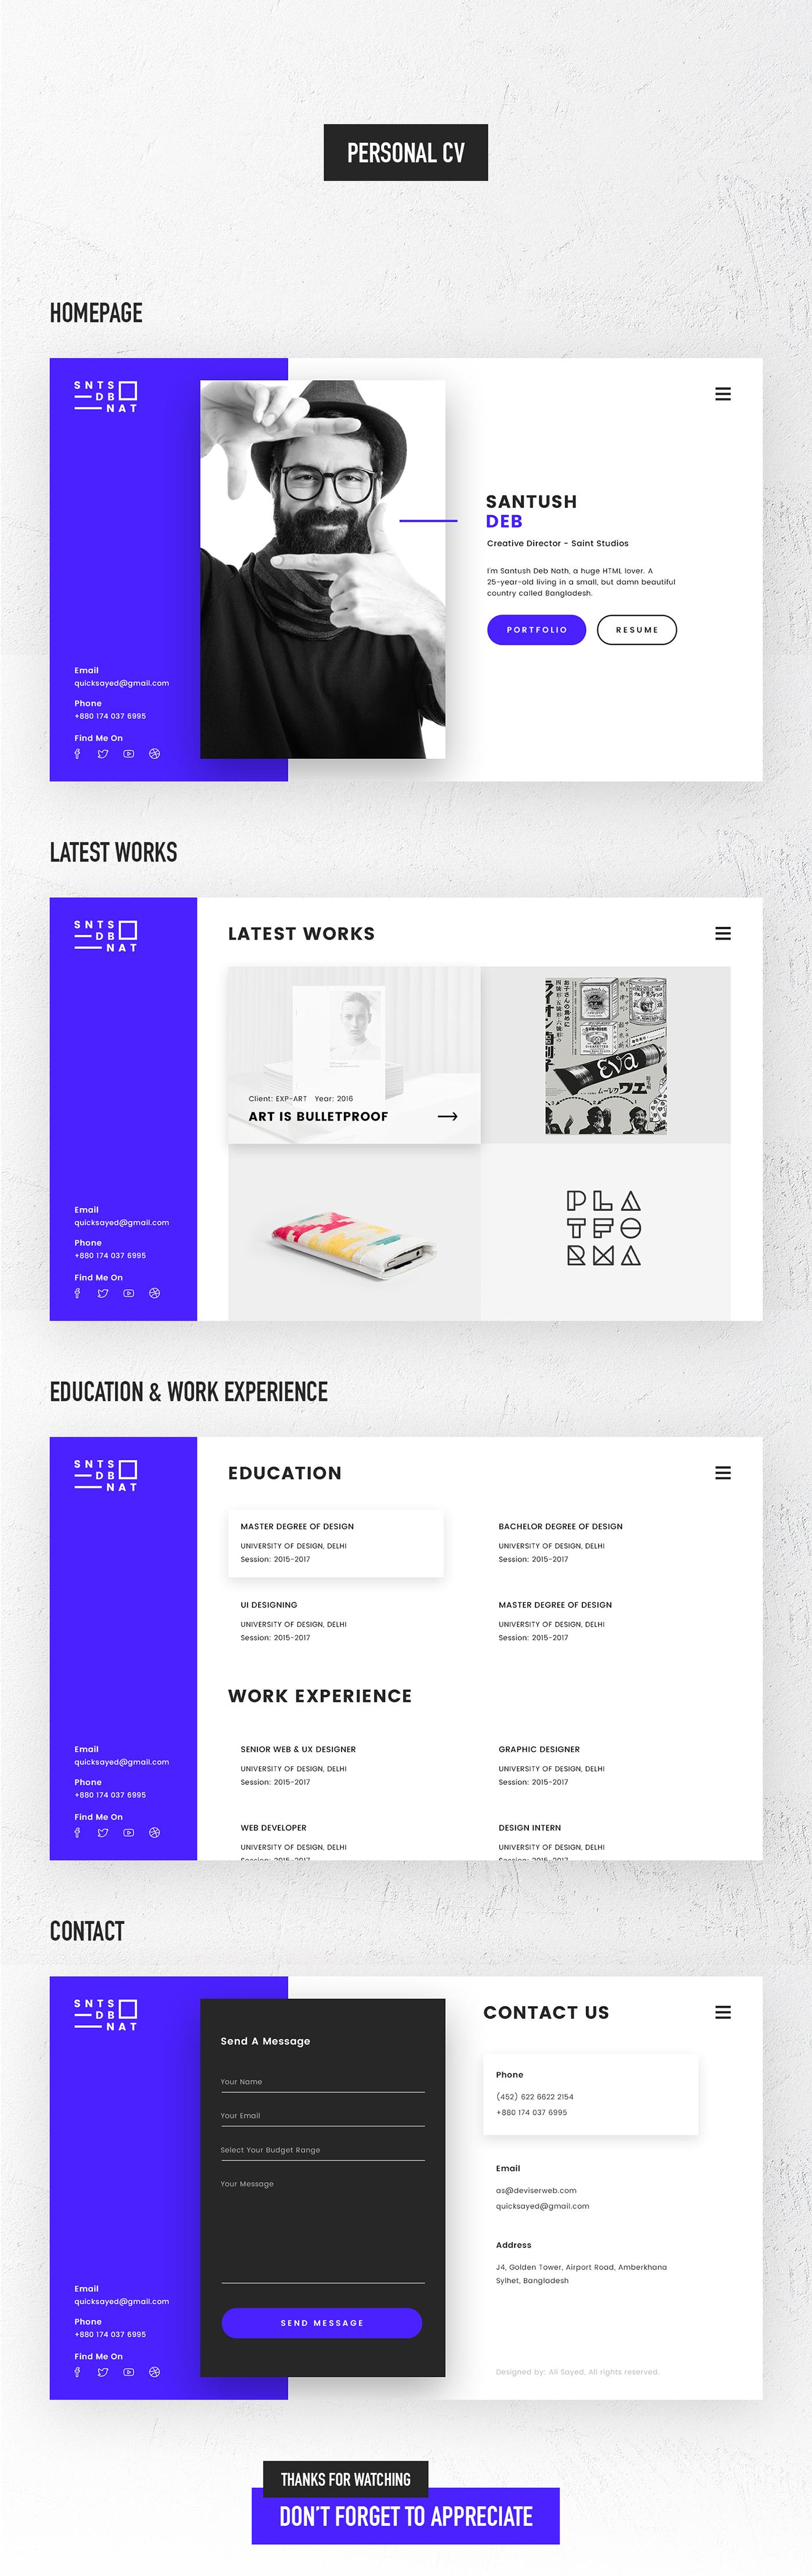 ux,UI,Web,site,Resume,vcard,personal,portfolio,simple,clean,modern,CV